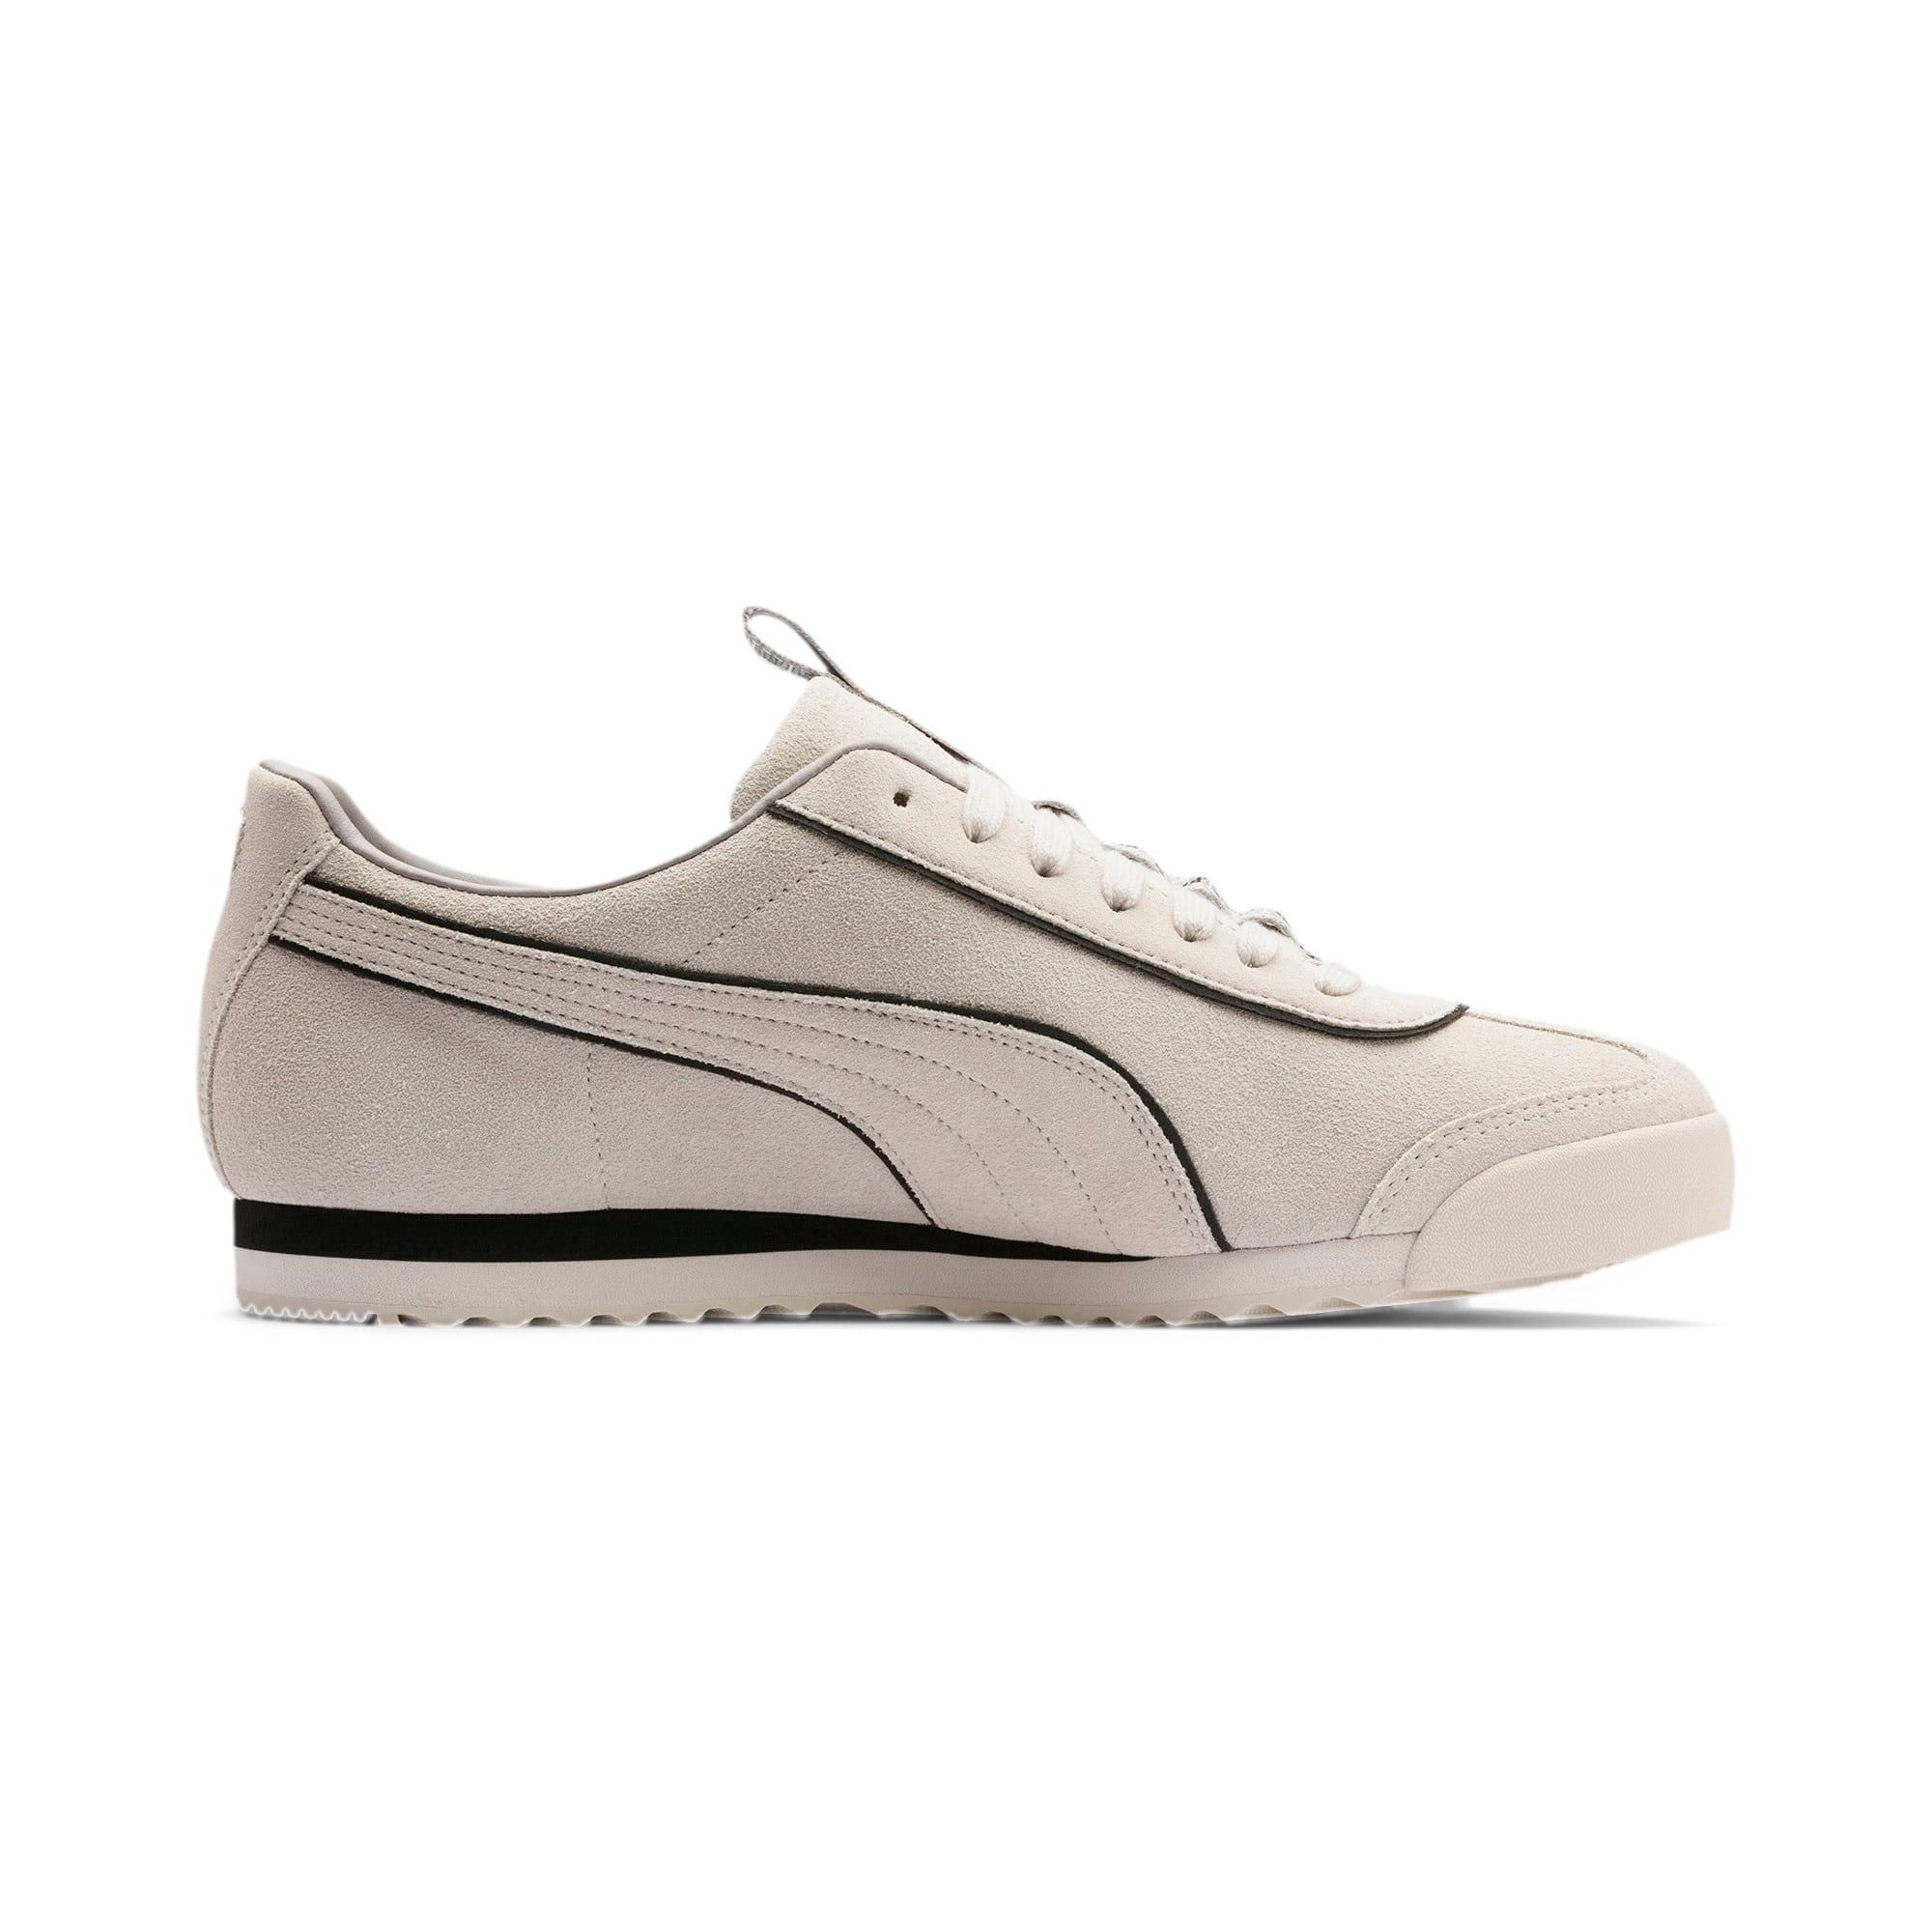 Miniatura 5 de Zapatos deportivos PUMA x THE GODFATHER Roma Woltz, WINDCHIME-Puma negro, mediano